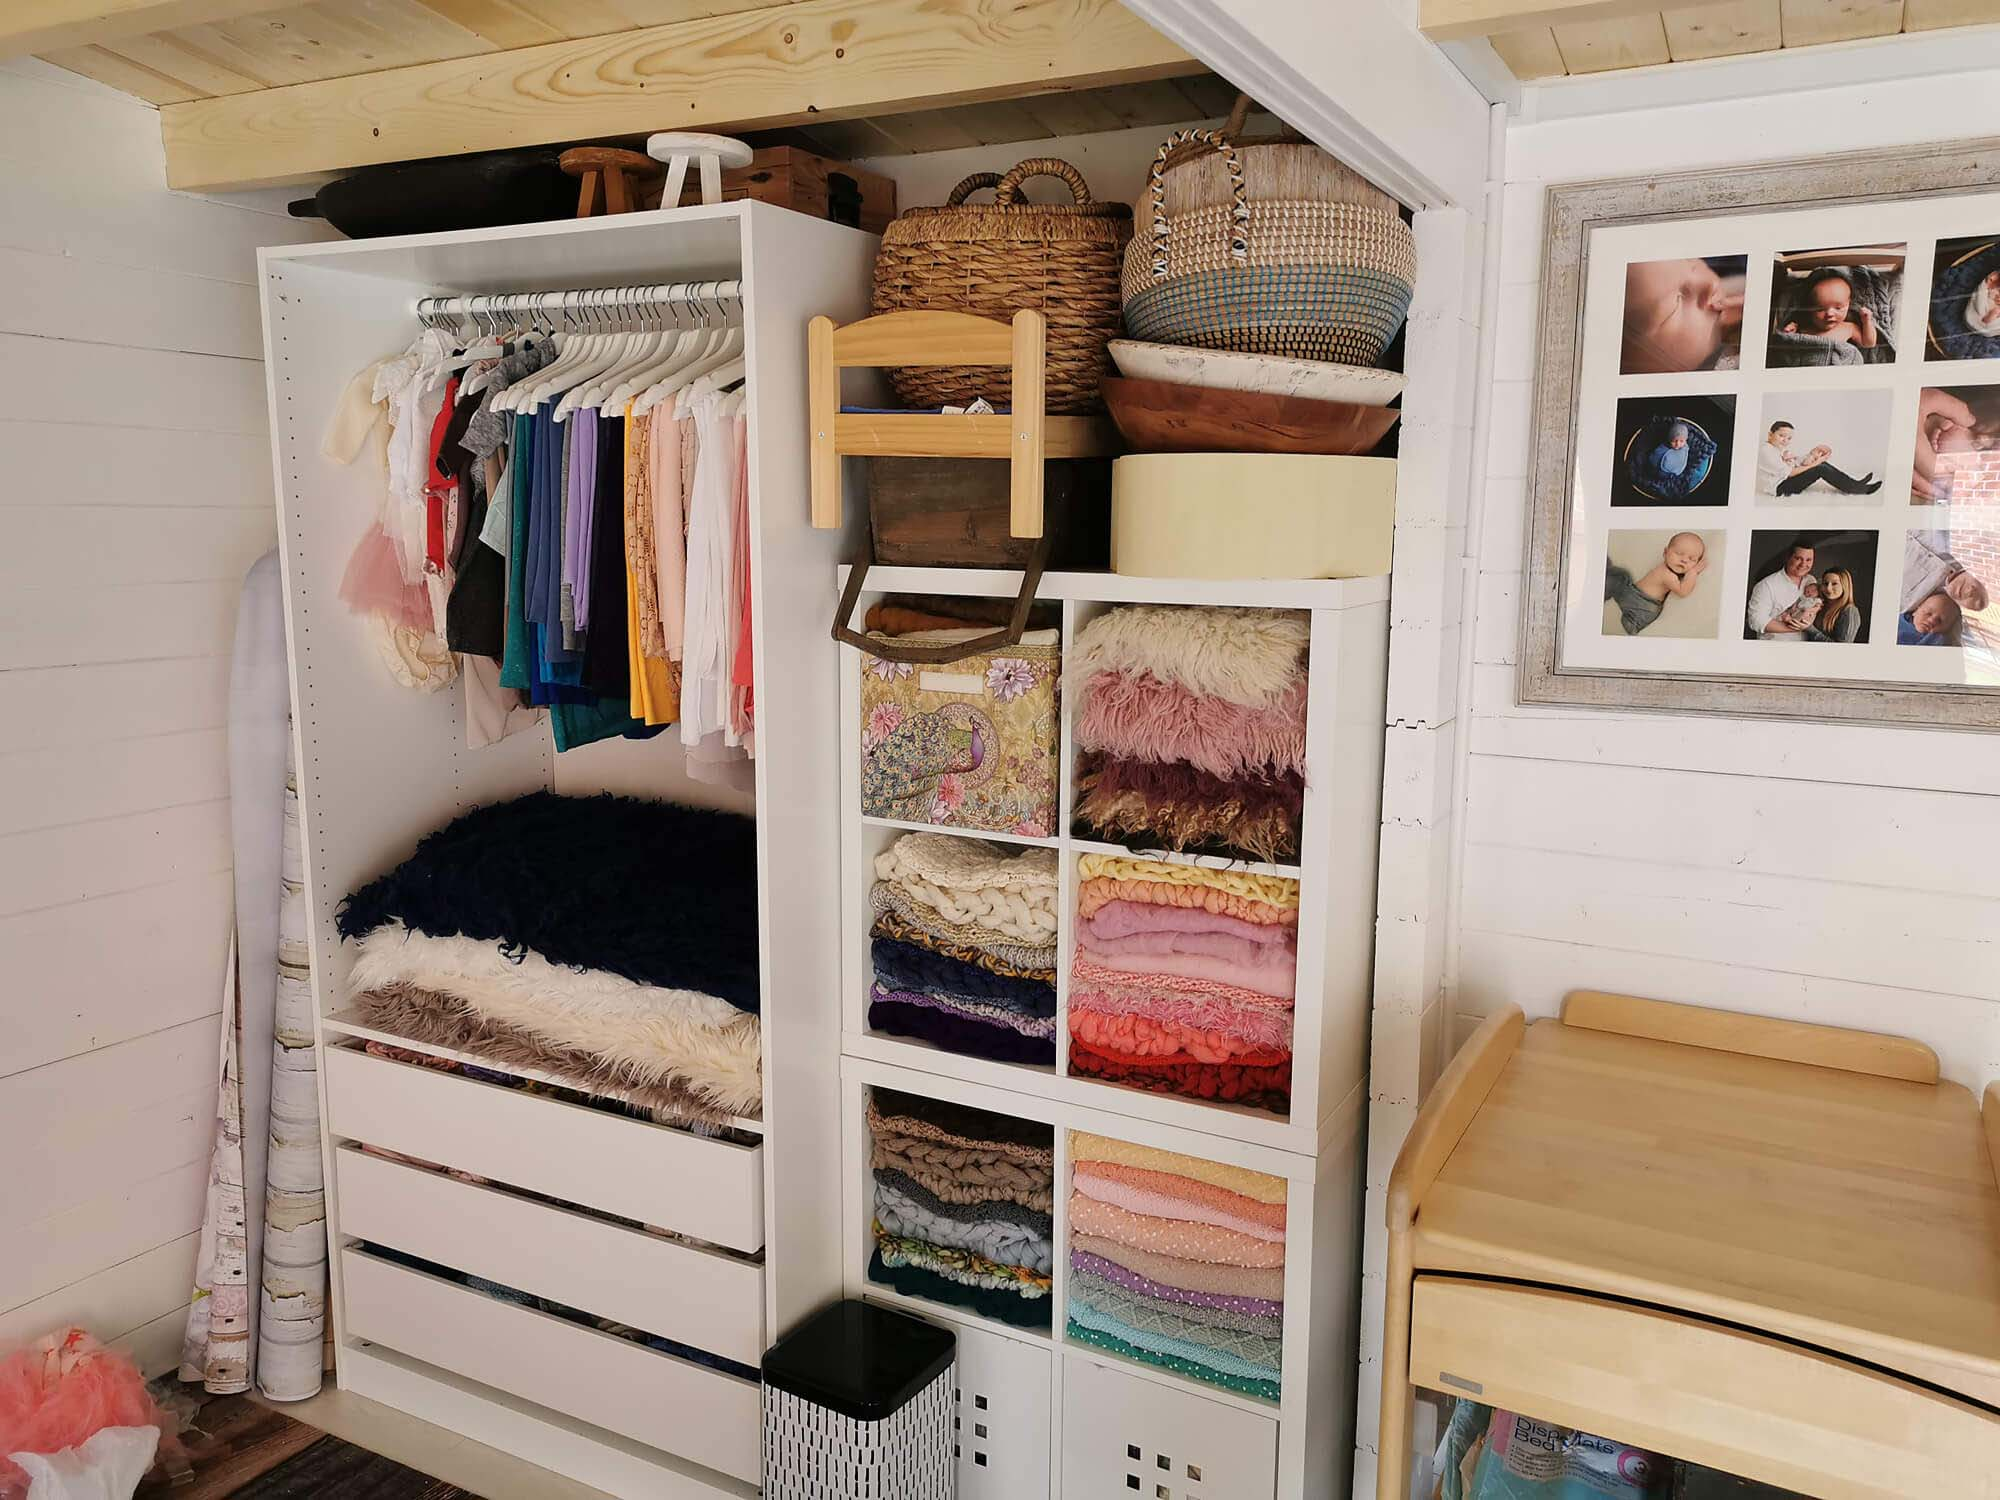 studio iside with wardrobe